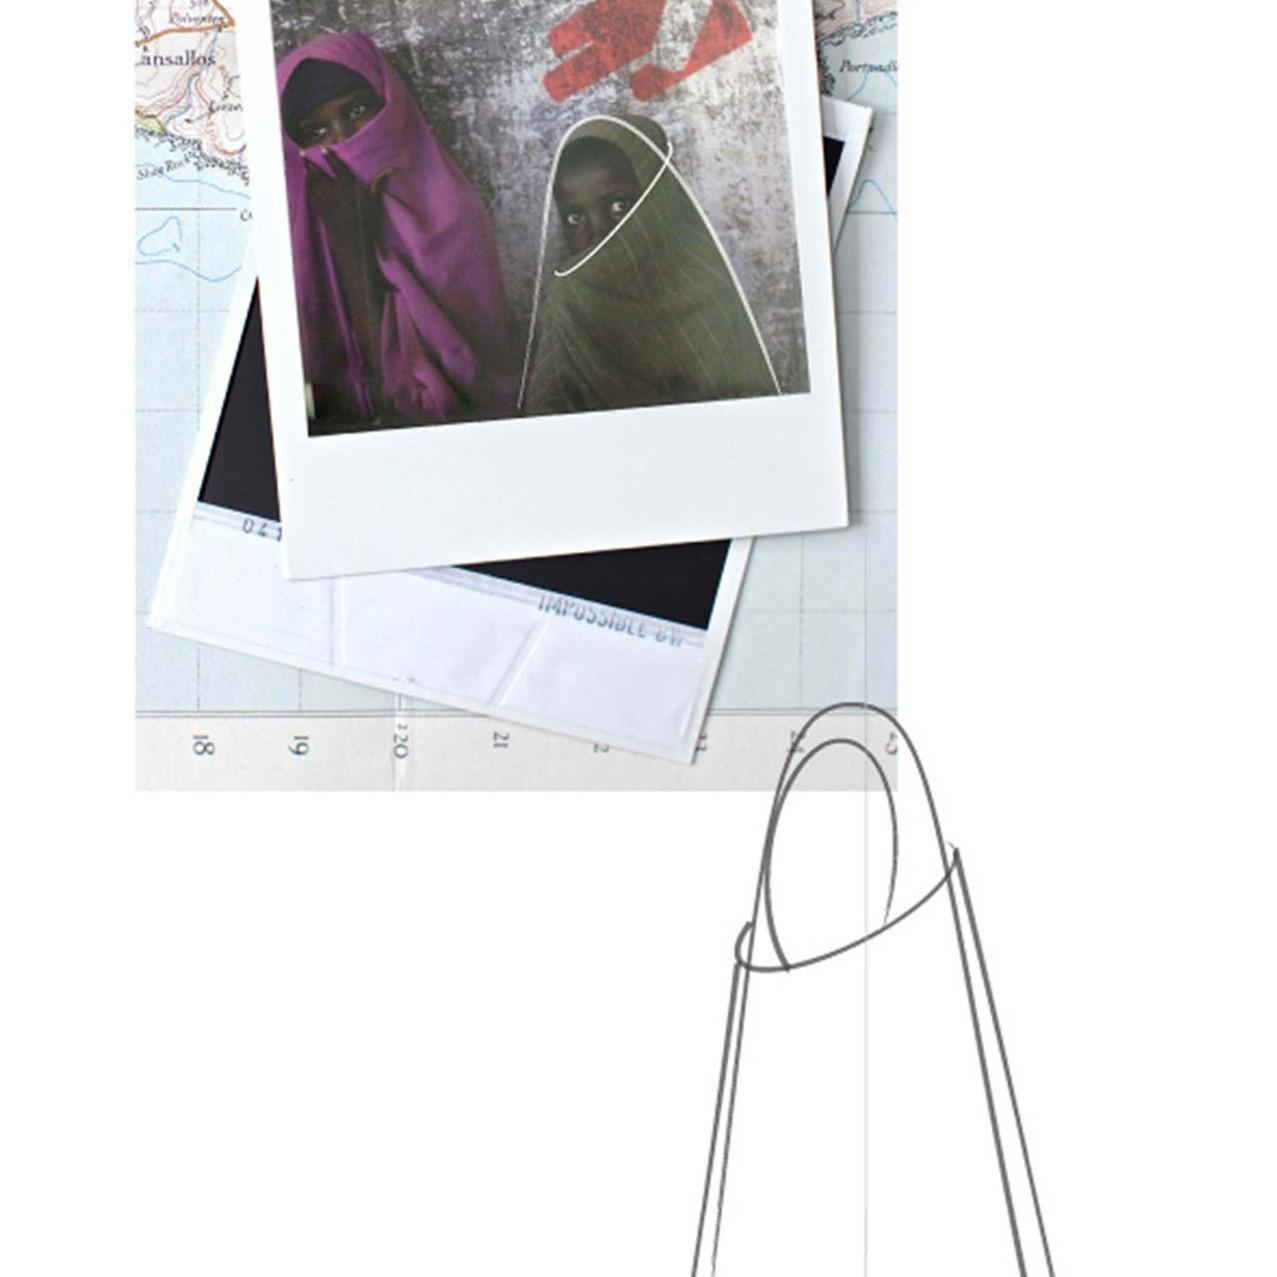 AFRICA-Lampada-di-design-11-2.jpg